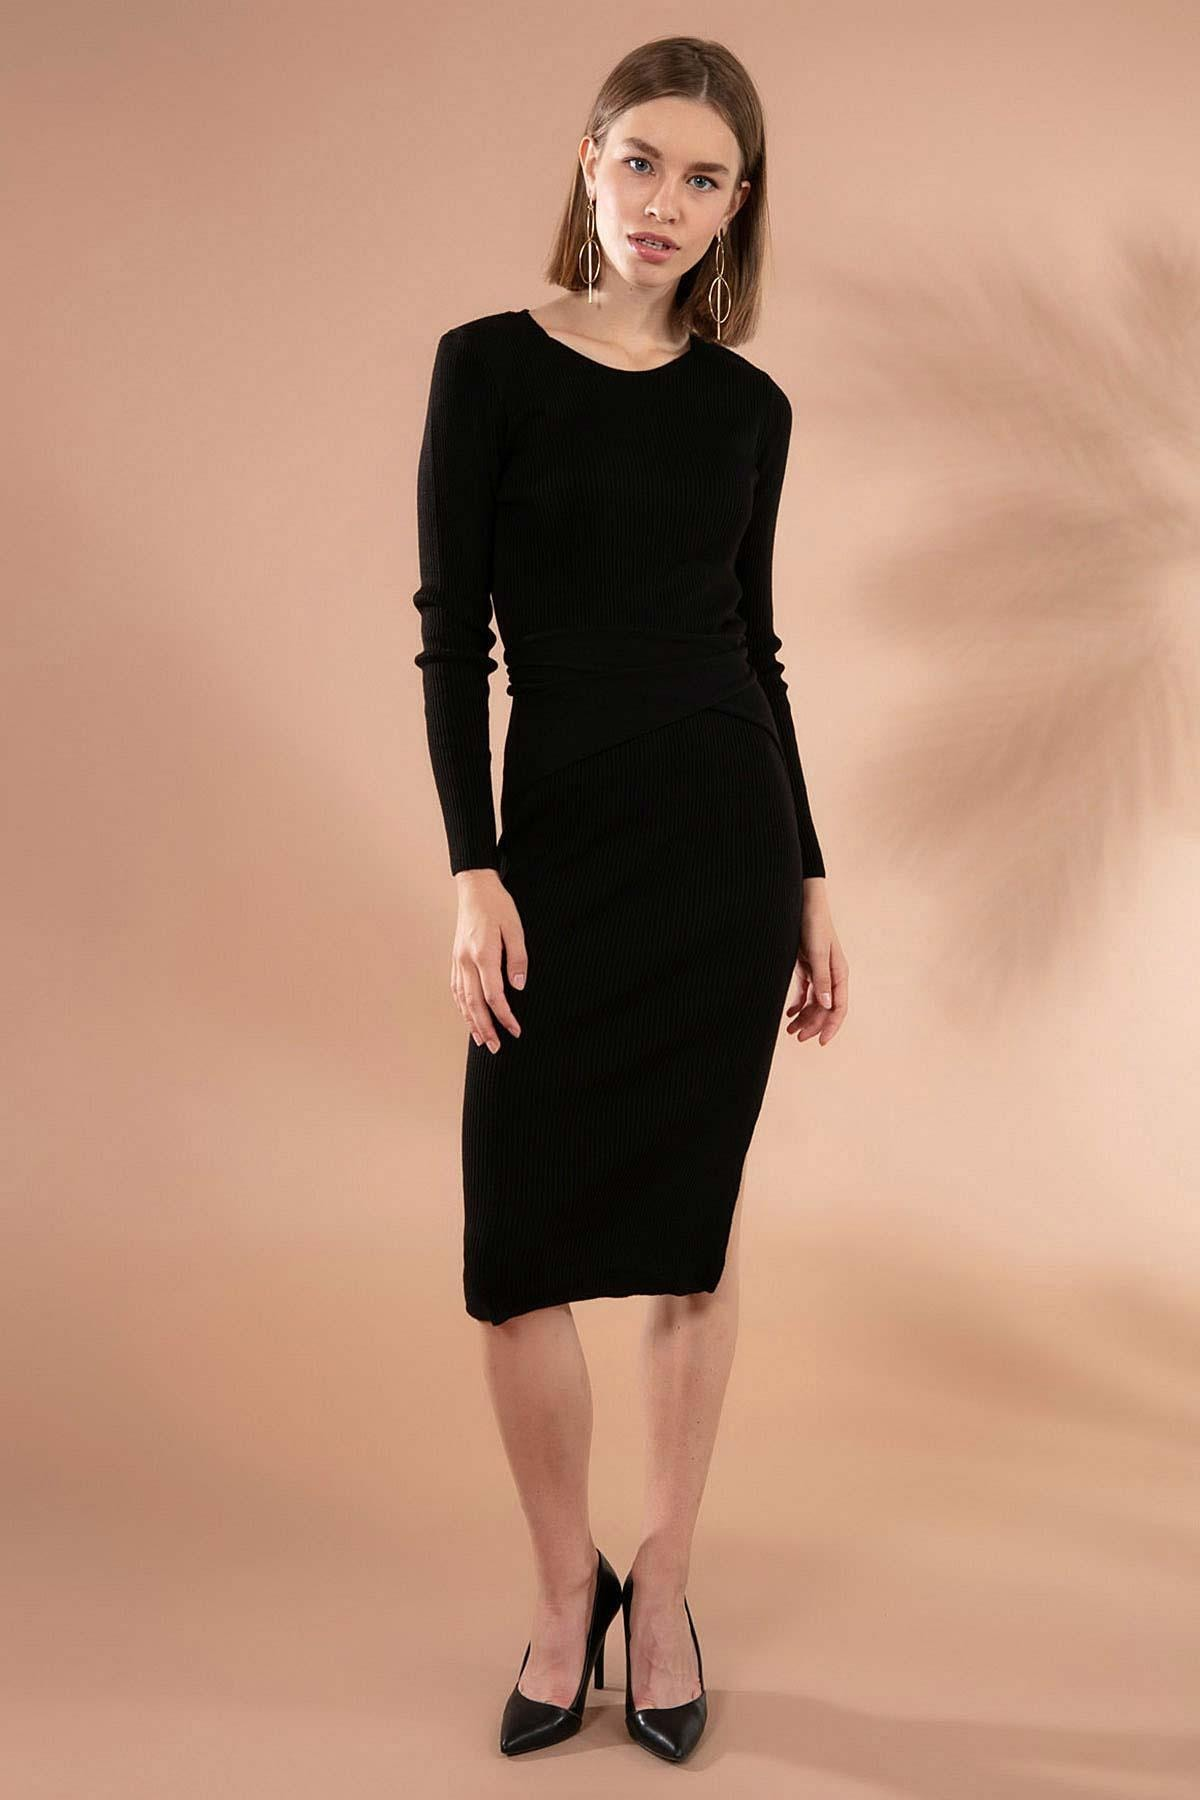 Y-London Kadın Siyah Fitilli Kuşak Detaylı Yırtmaçlı Triko Elbise Y20W106-0562